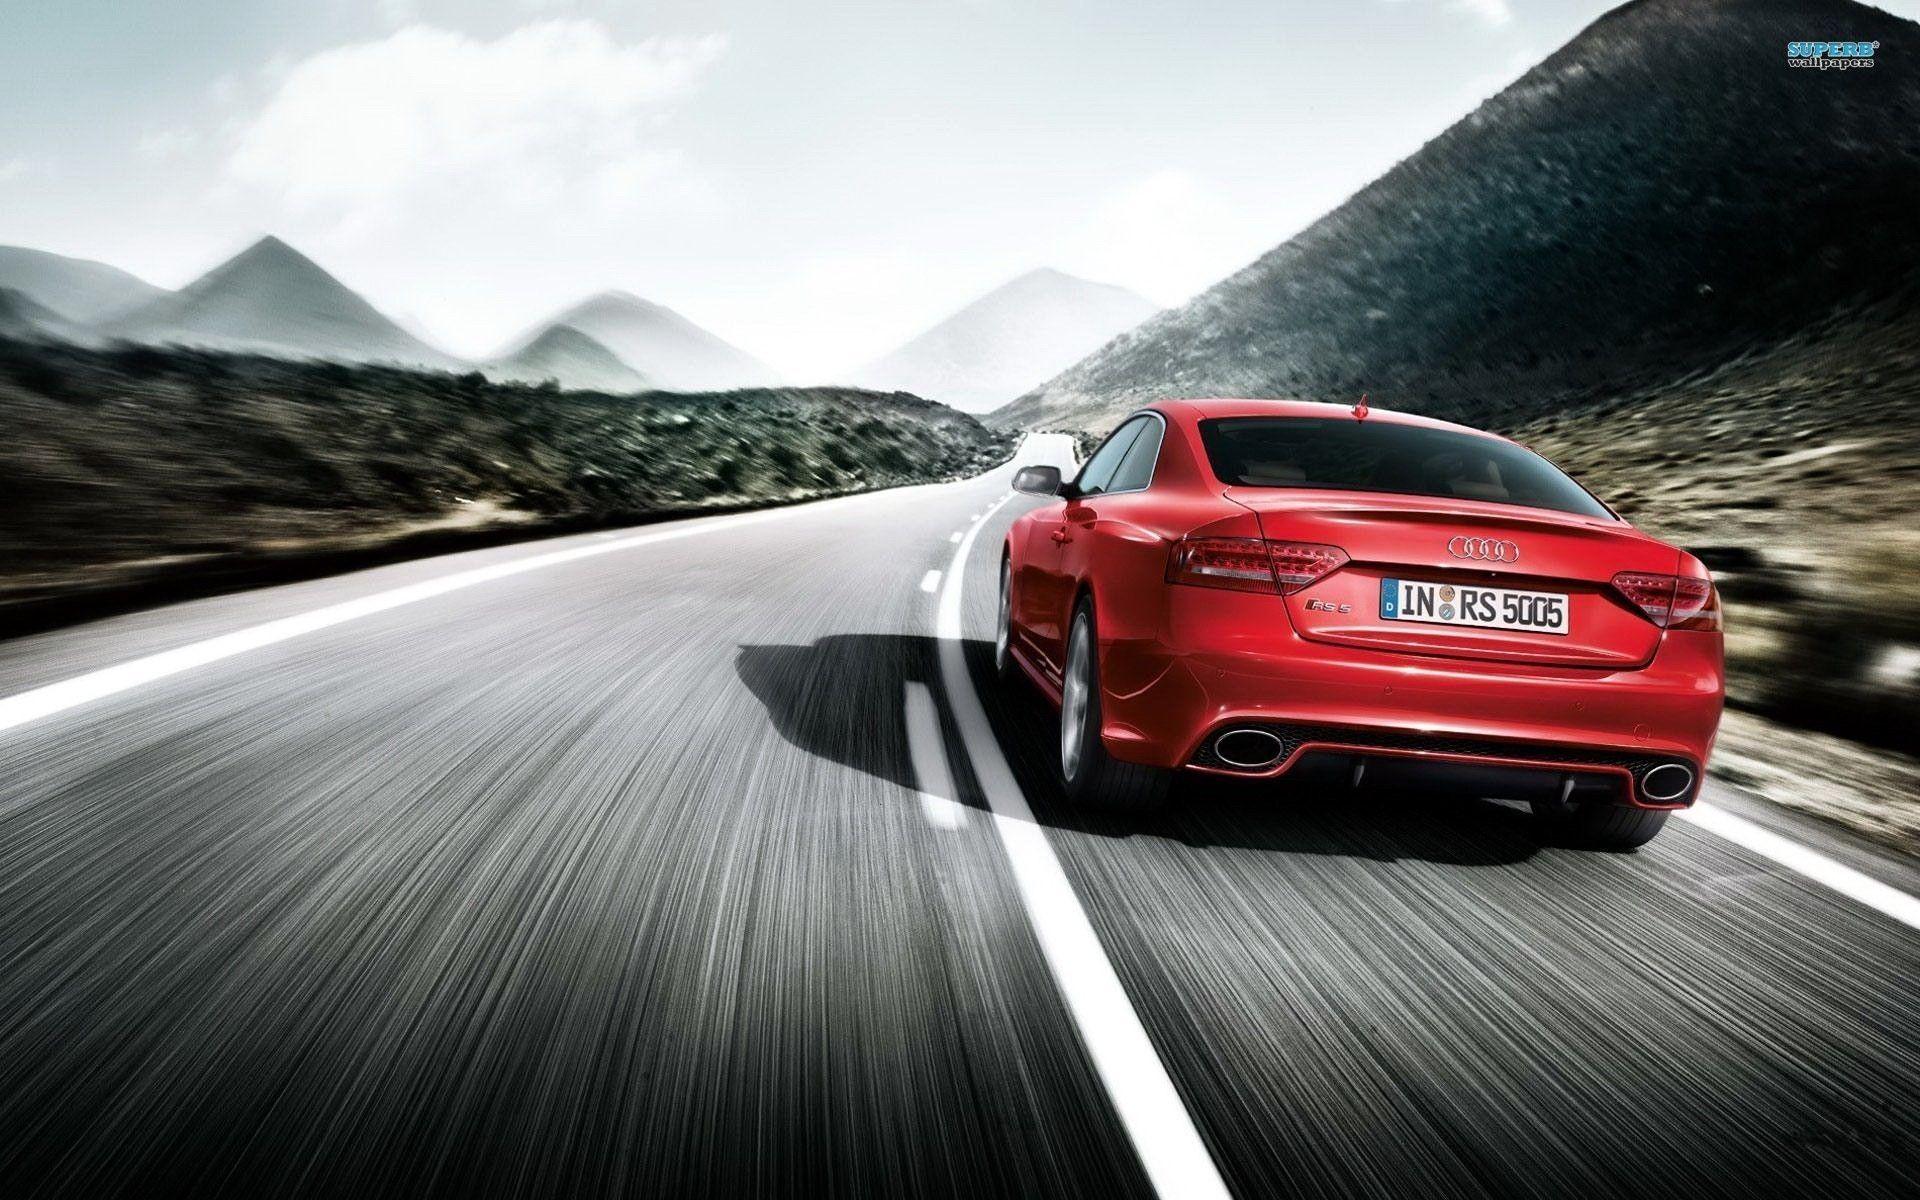 1920x1440 Bild: Audi RS5 Front Und Seitenansicht Wallpapers And Stock  Photos. Â«